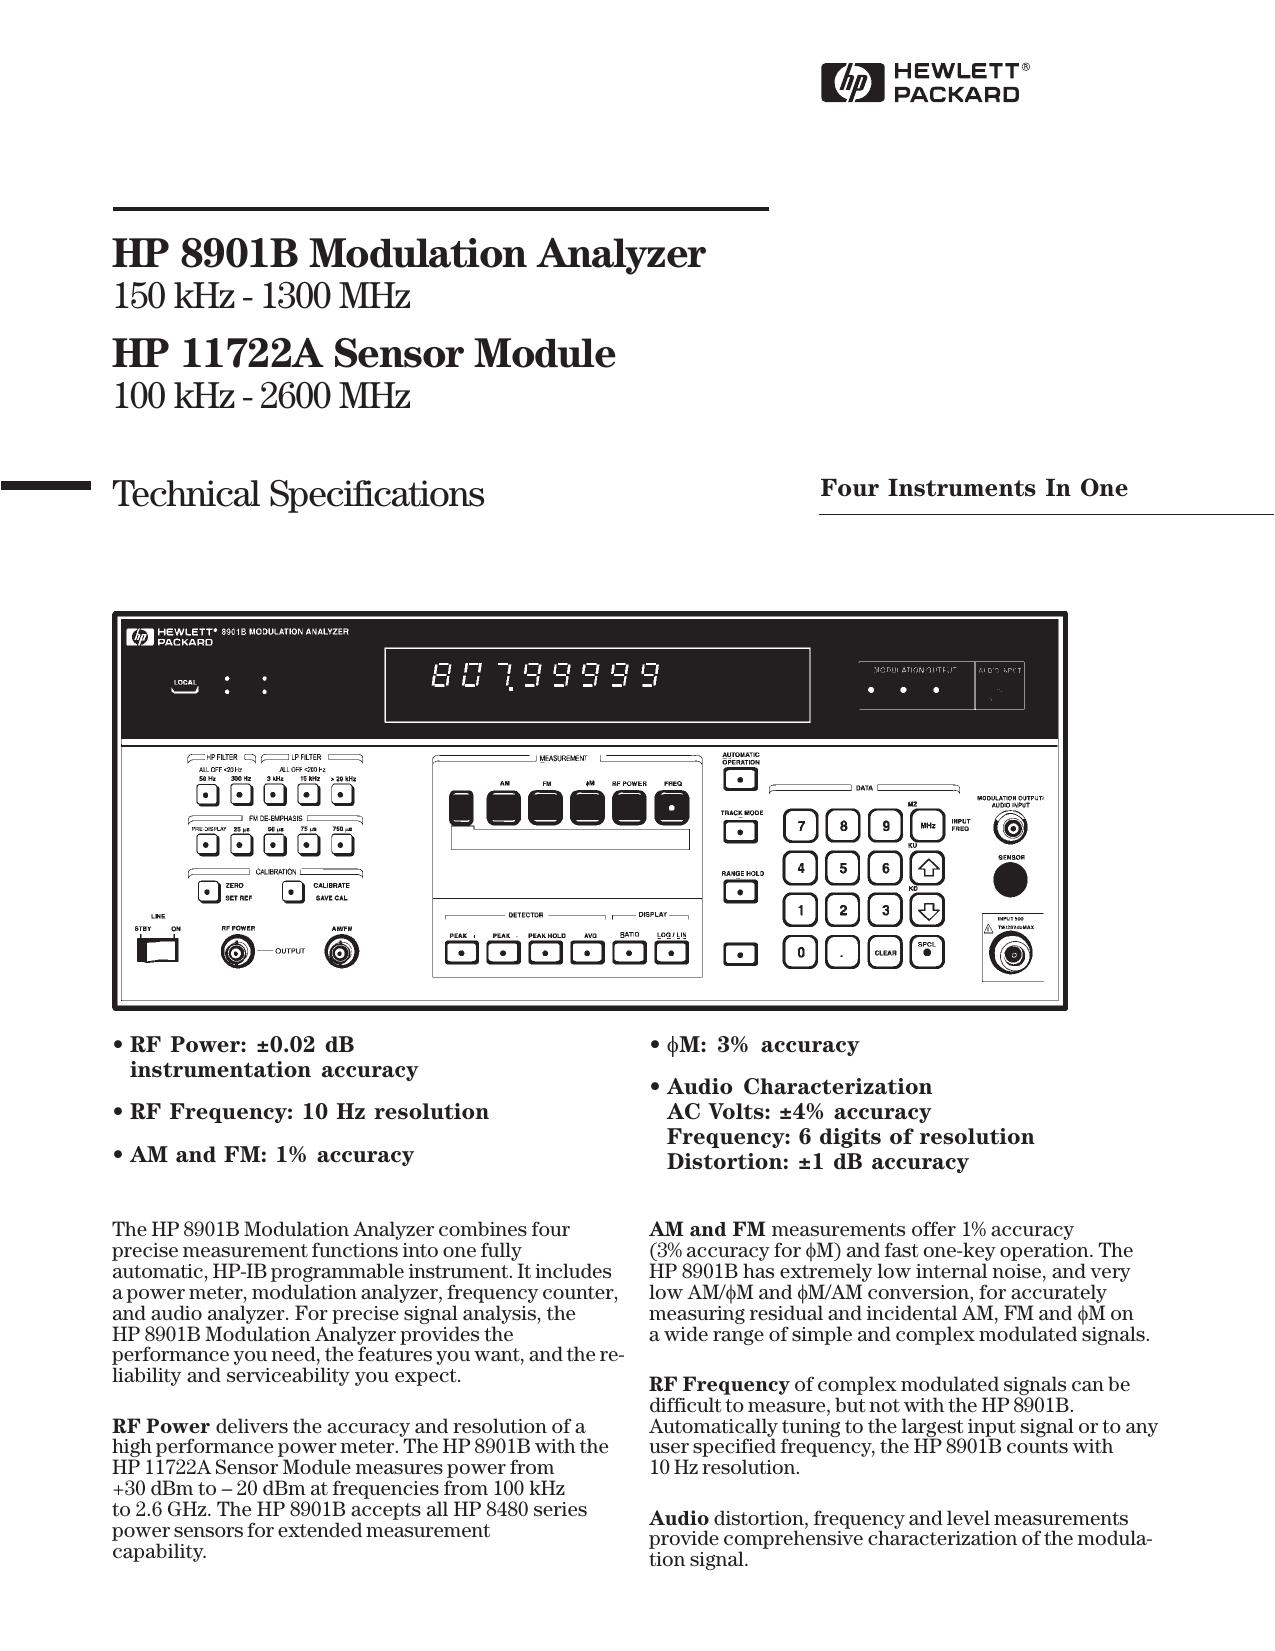 HP 8901B Modulation Analyzer HP 11722A Sensor Module | manualzz com